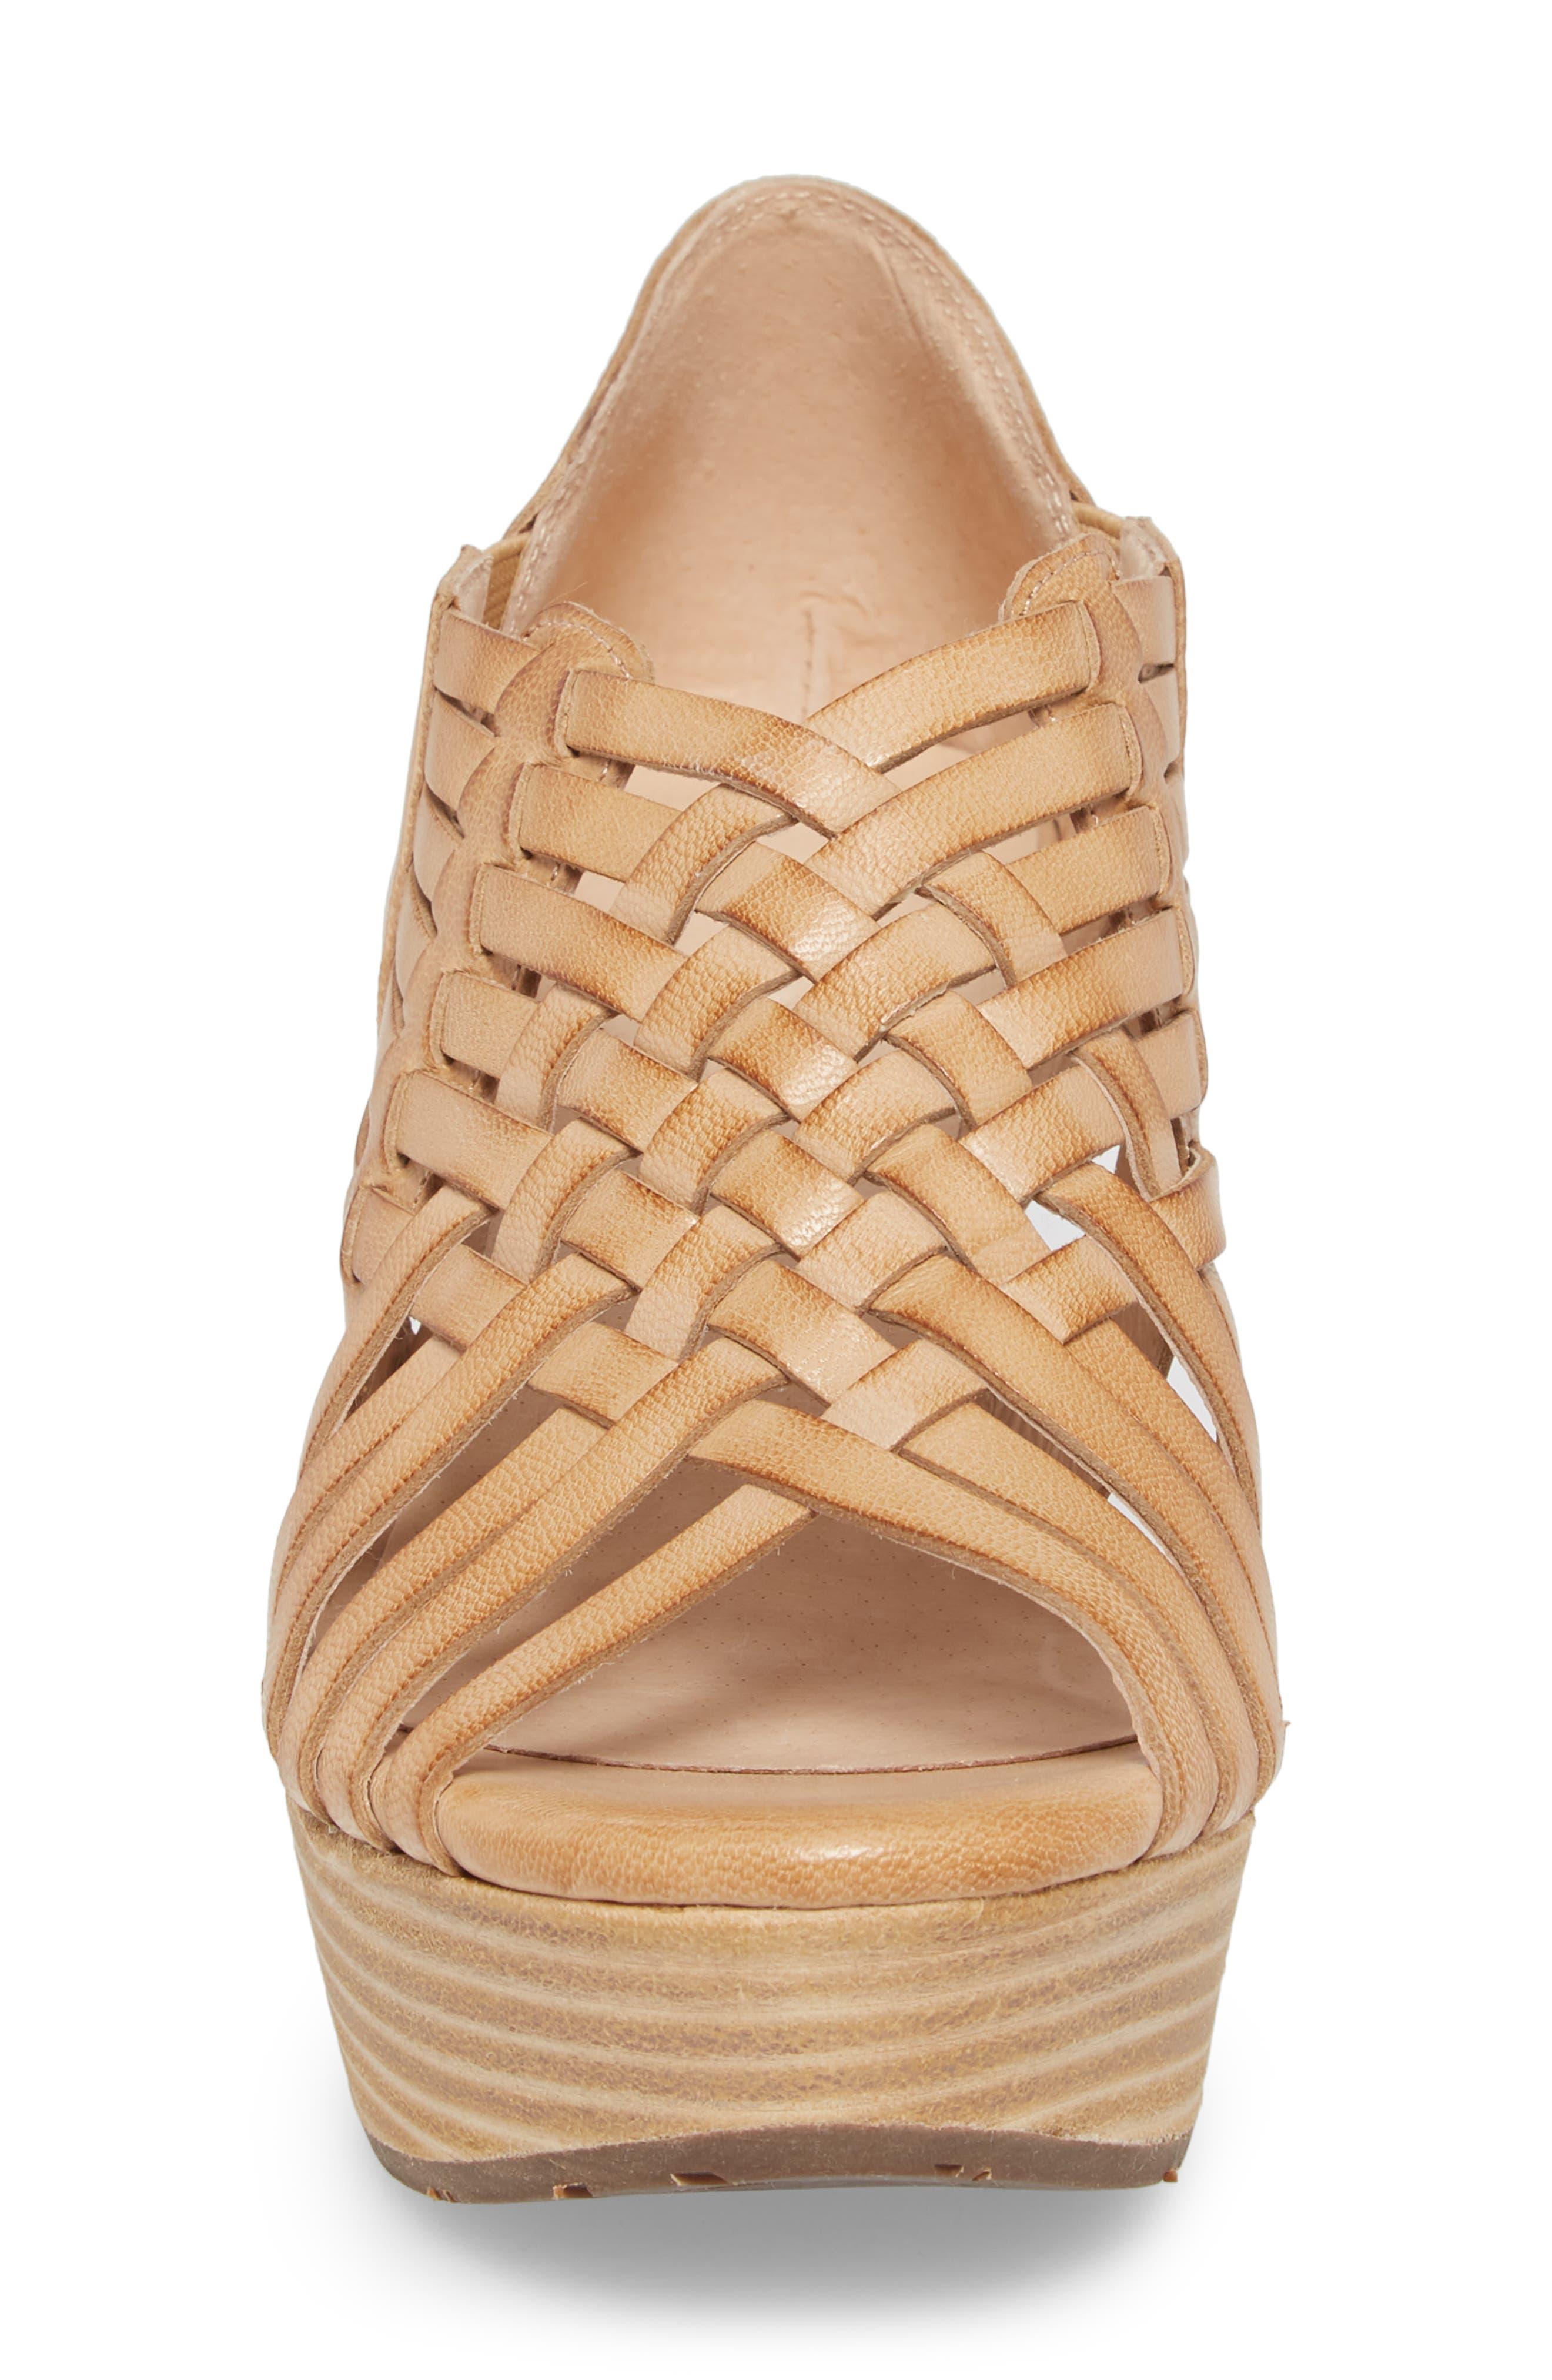 Woody Wedge Sandal,                             Alternate thumbnail 4, color,